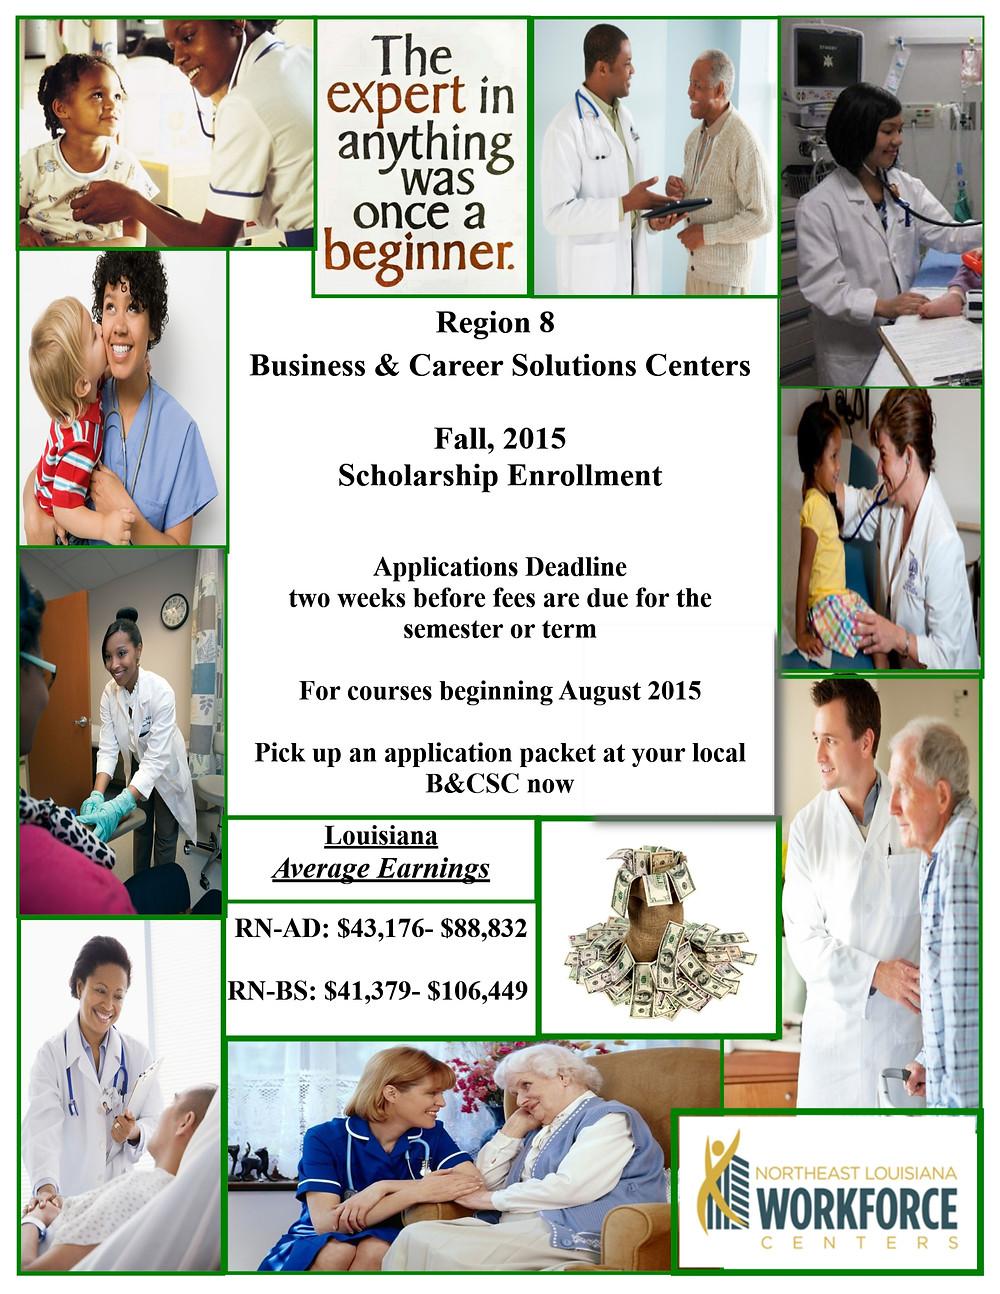 Region 8 Nurse Flyer with salaries 2015-page1.jpg